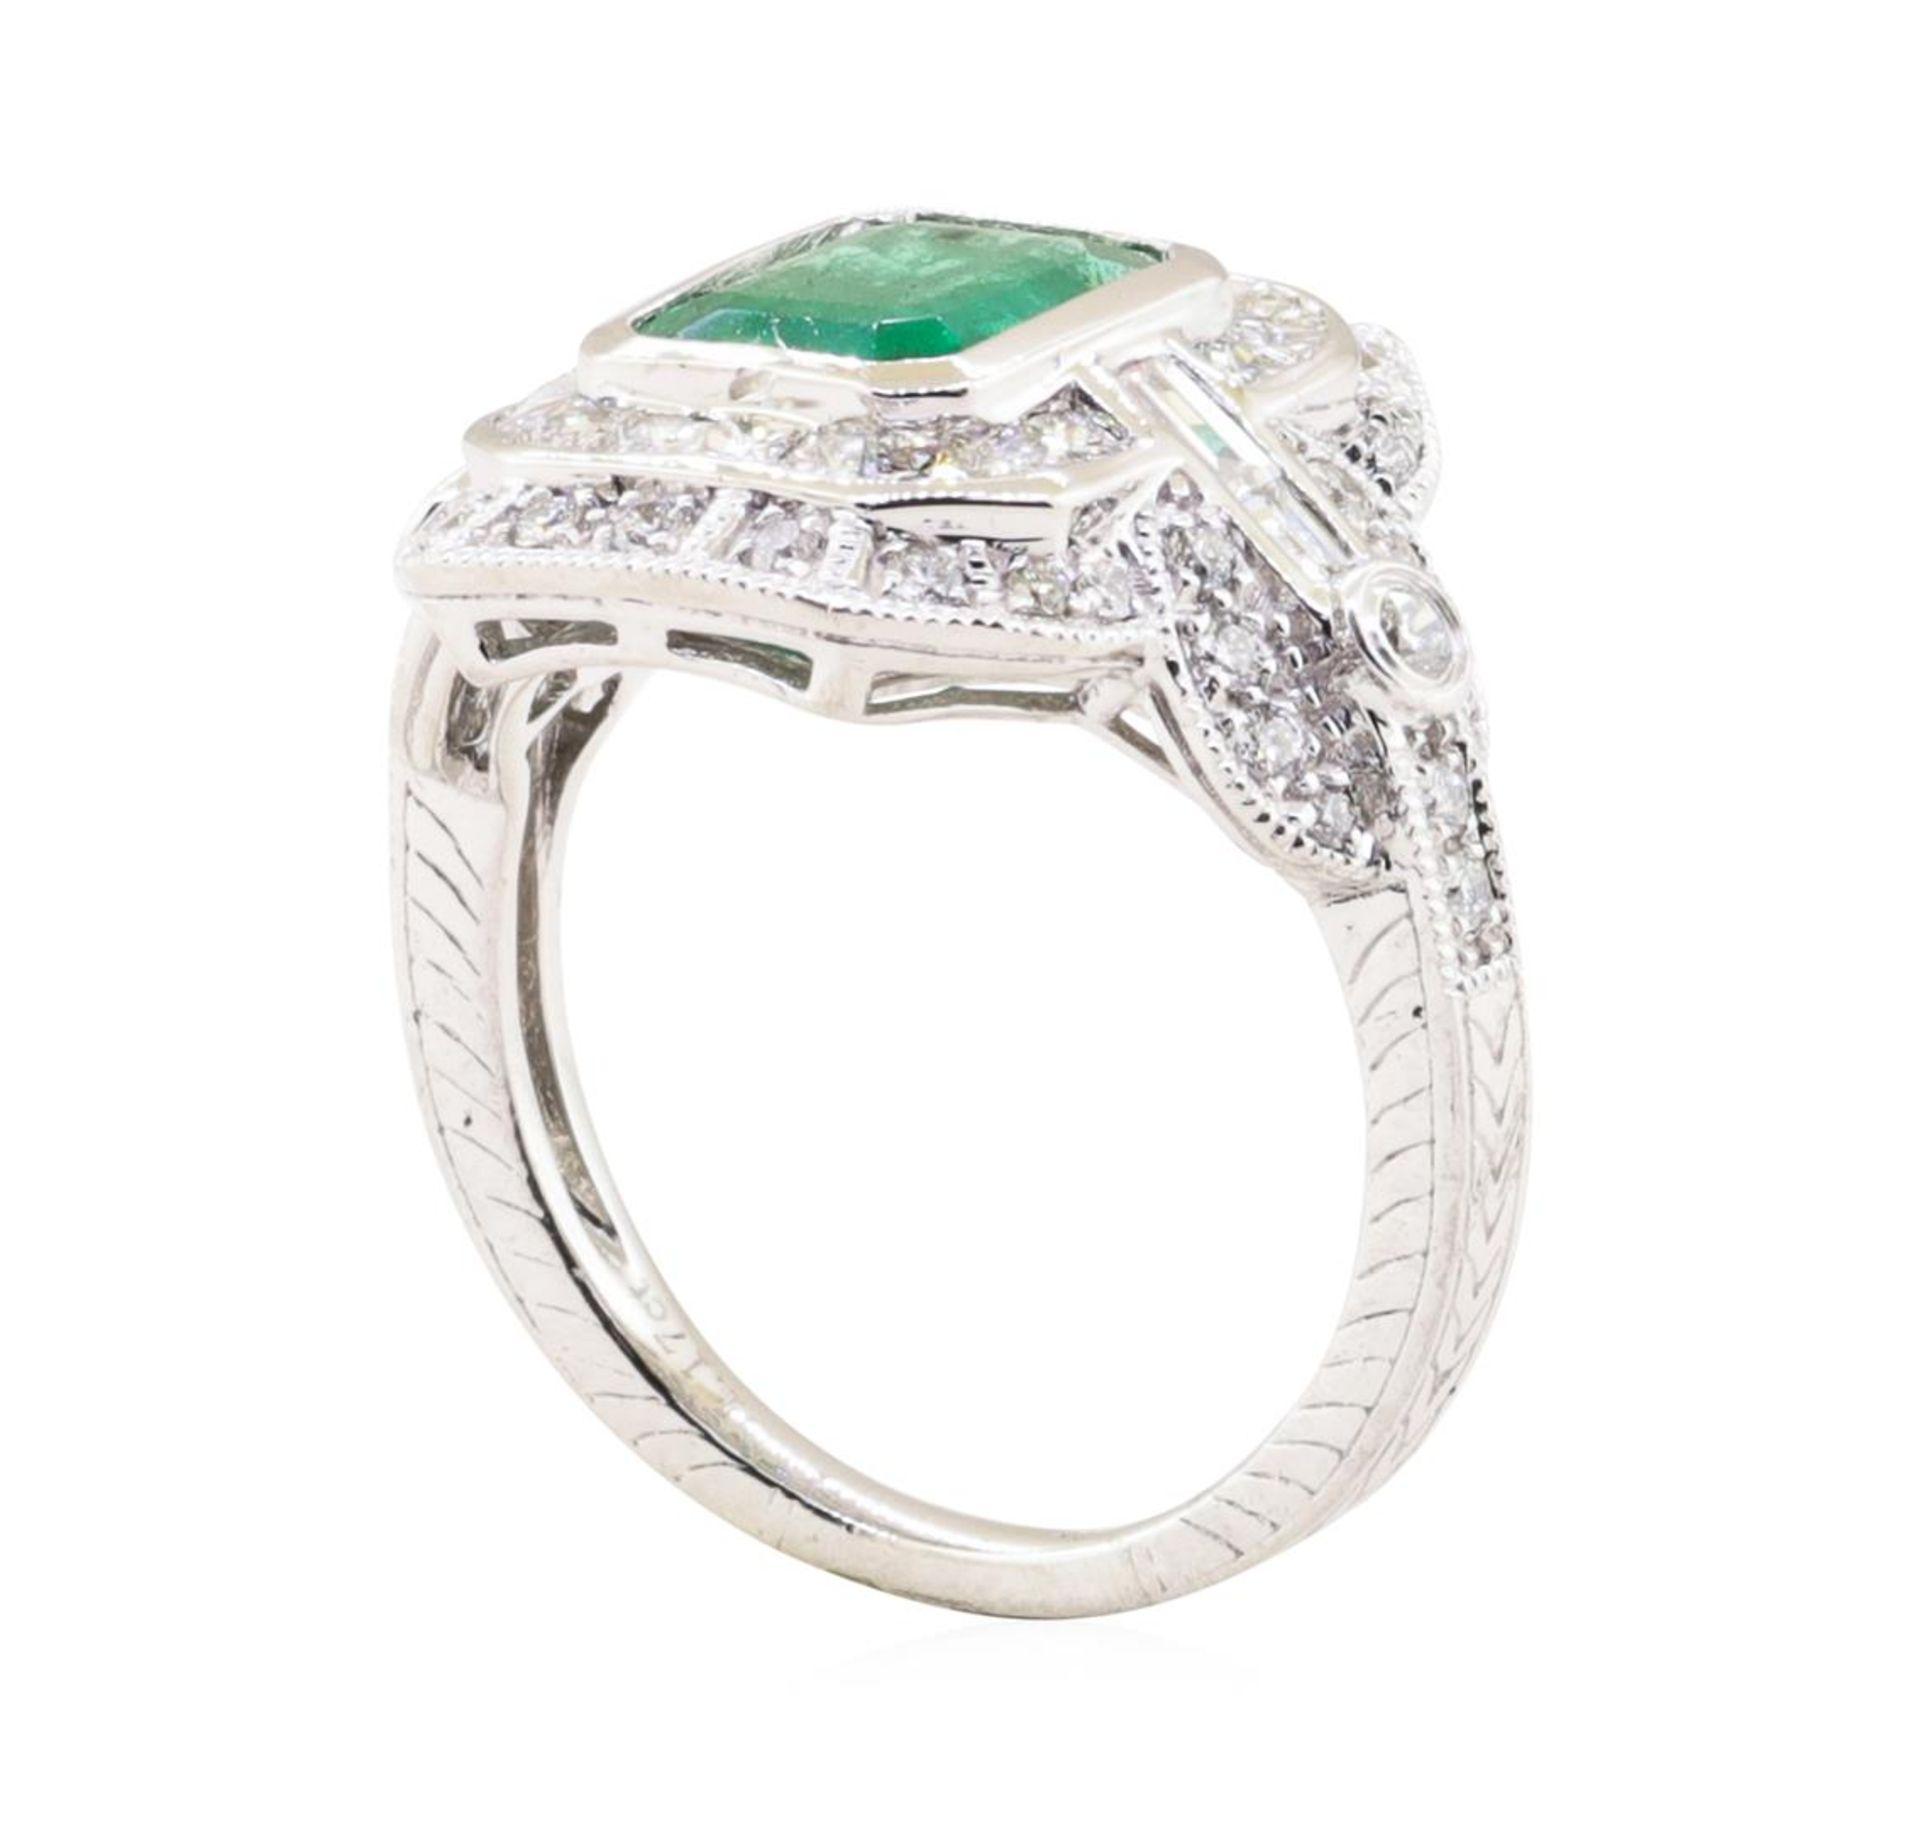 1.94ct Emerald and Diamond Ring - Platinum - Image 3 of 5